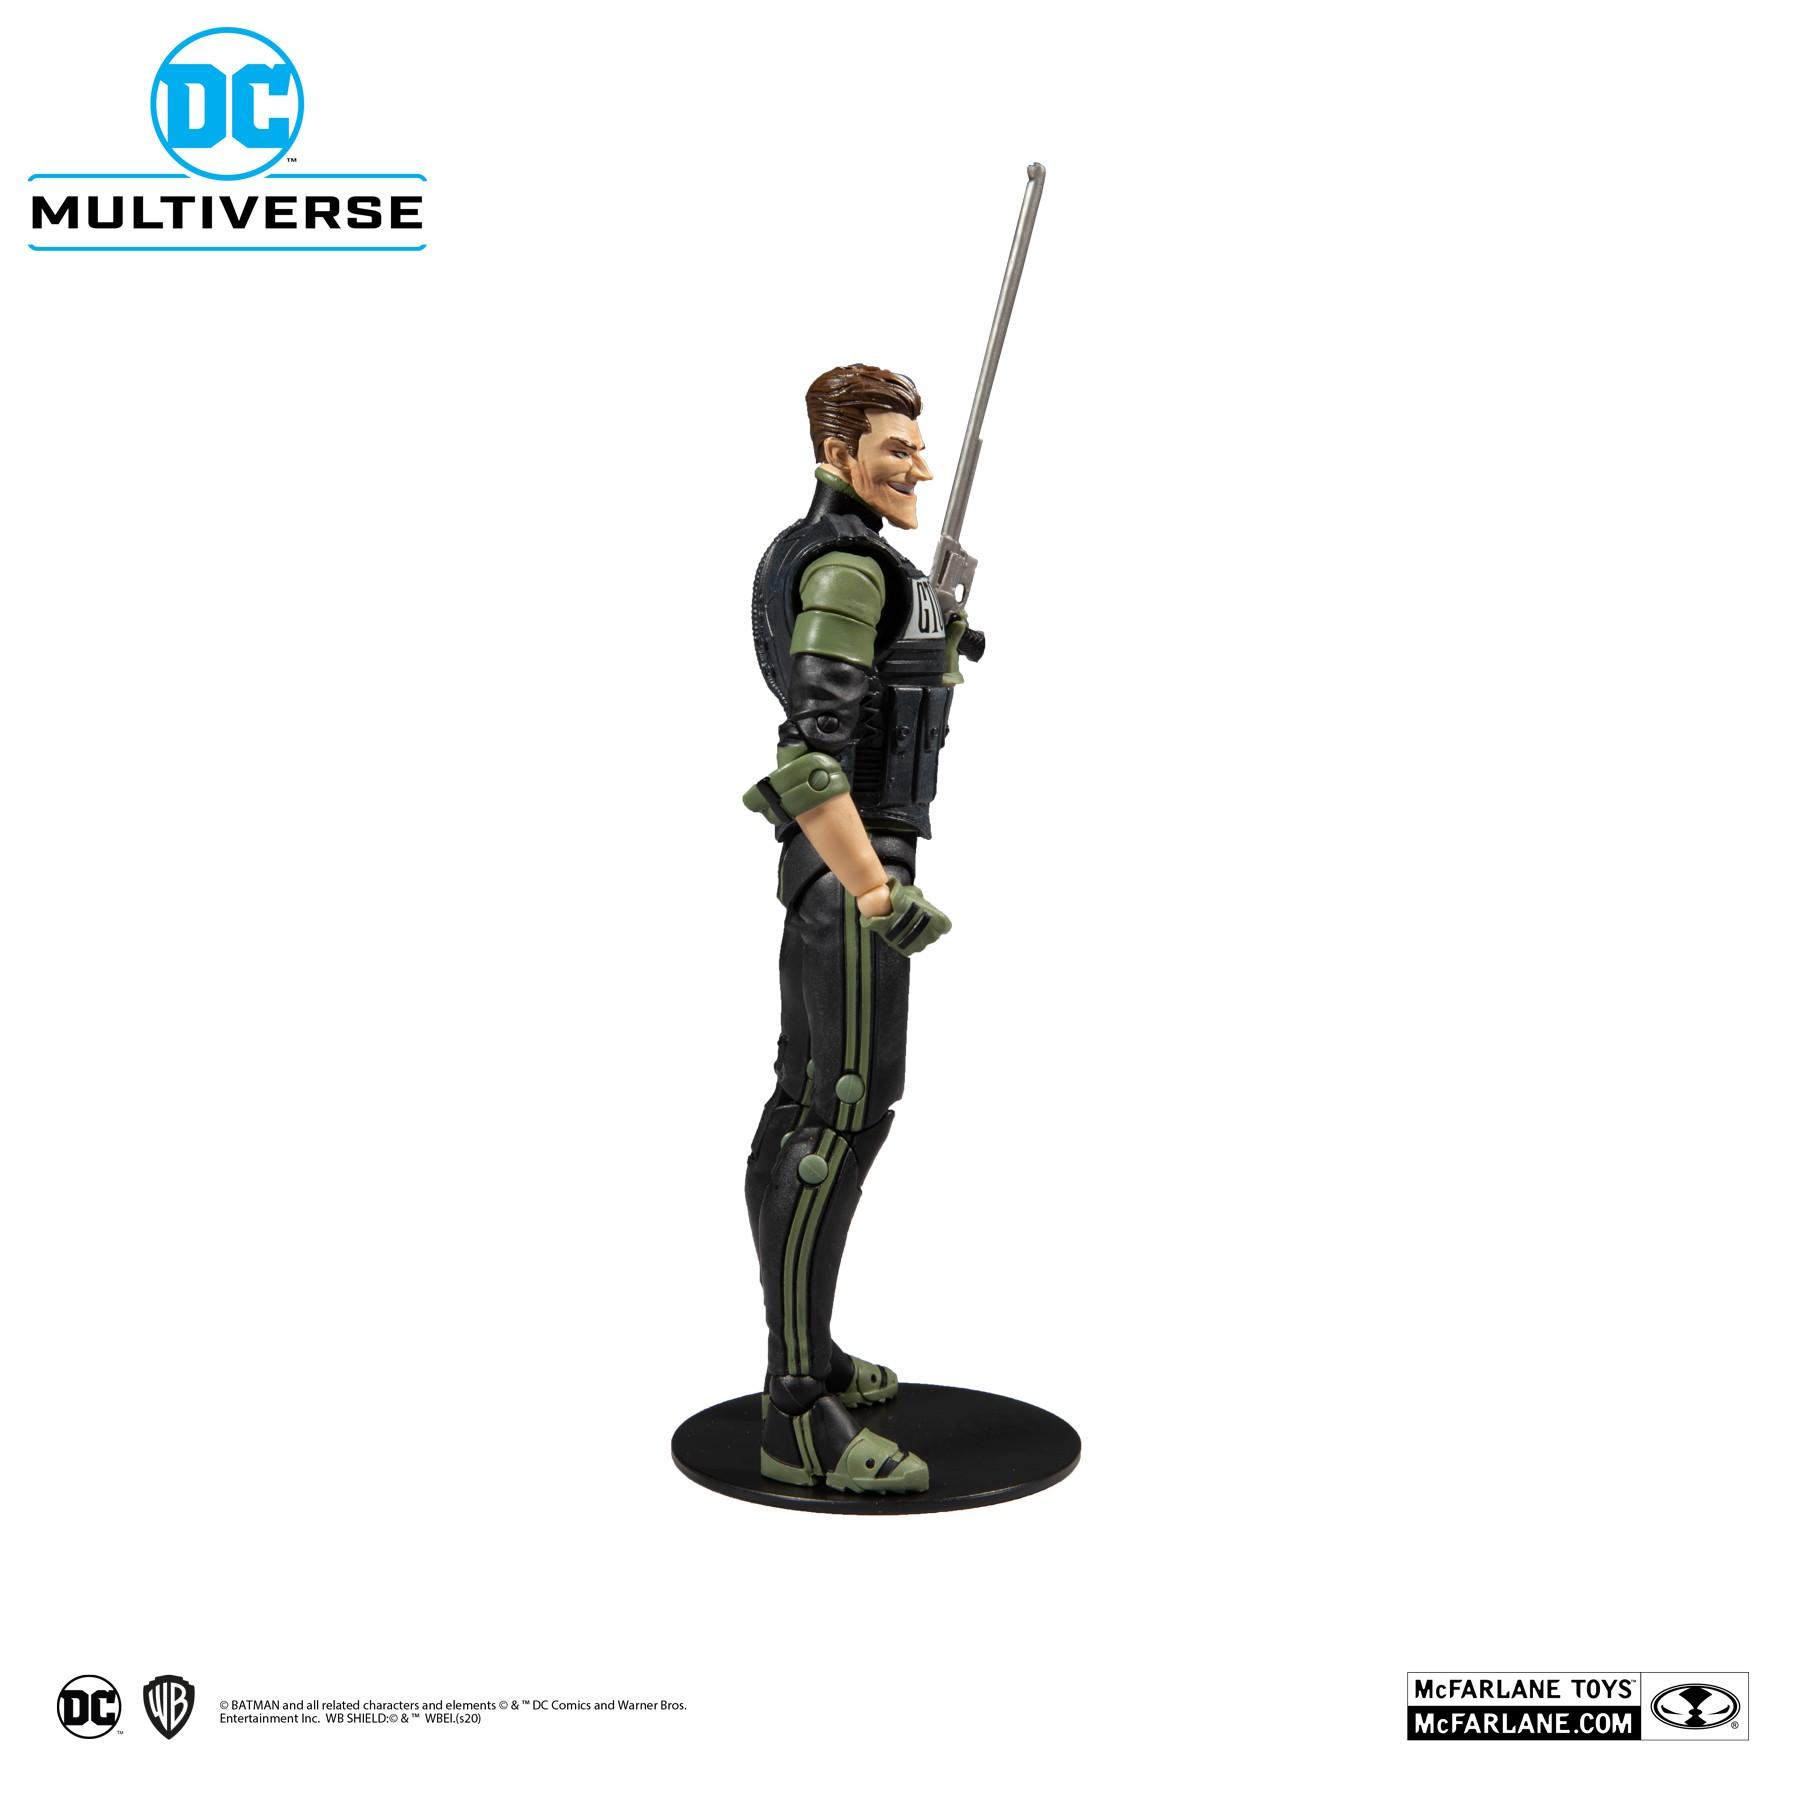 Action Figure Coringa O Cavaleiro Branco (The Joker White Knight): DC Multiverse - McFarlane Toys